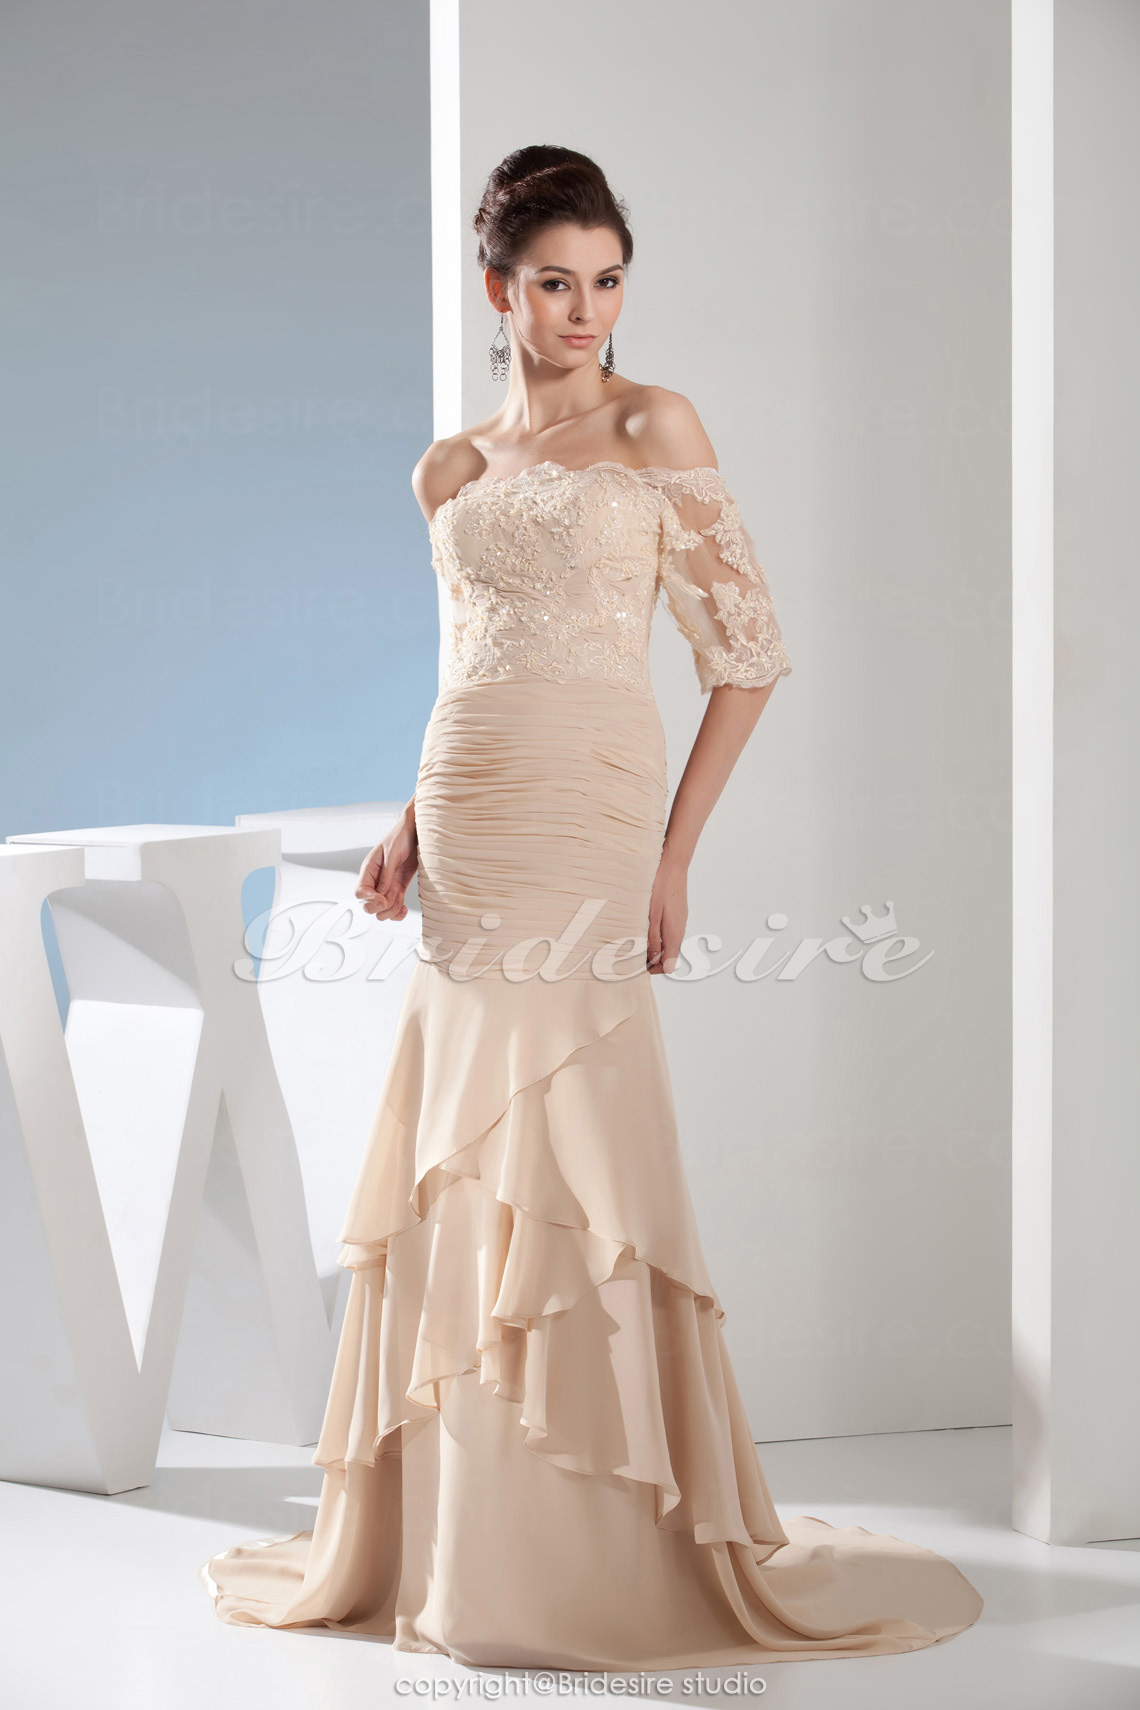 312dbf542683c7 Bridesire - Meerjungfrau-Linie / Mermaid-Stil trägerloser Ausschnitt  bodenlang Sweep/Pinsel Zug Halbe Ärmel Chiffon Kleid [BD4668] - €118.84 :  Bridesire